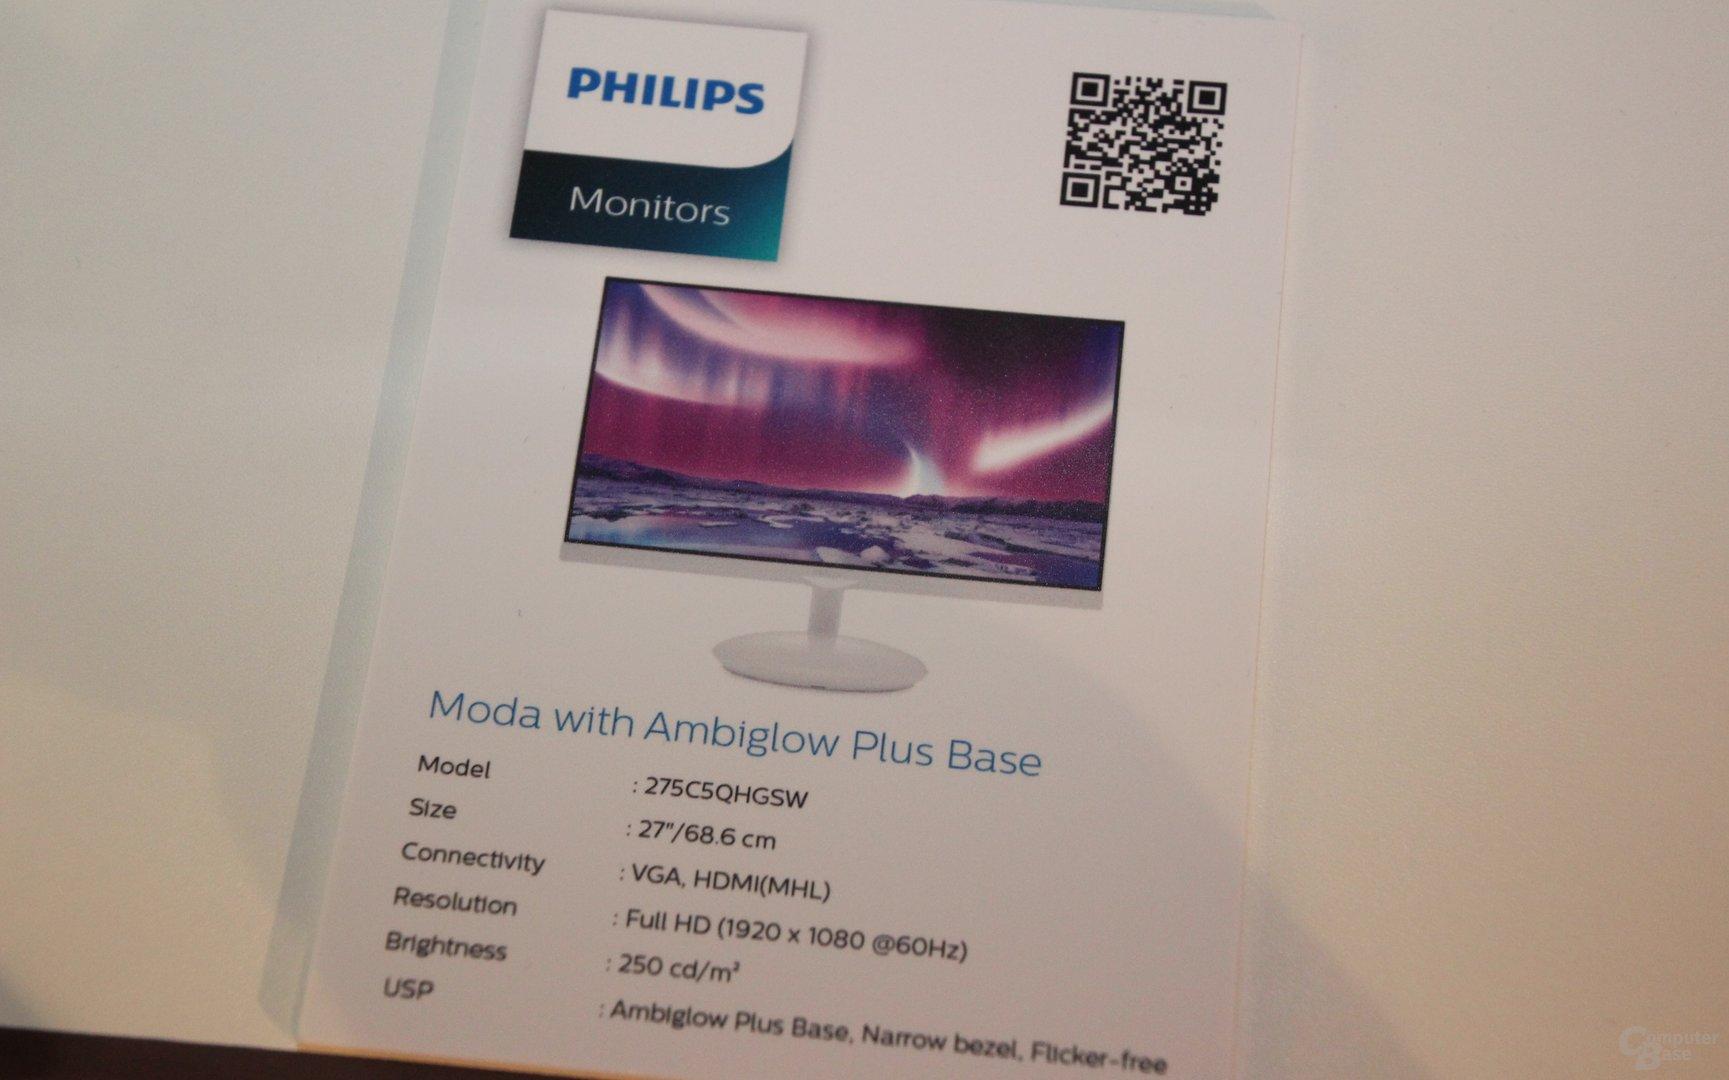 Philips Moda 275C5QHGSW